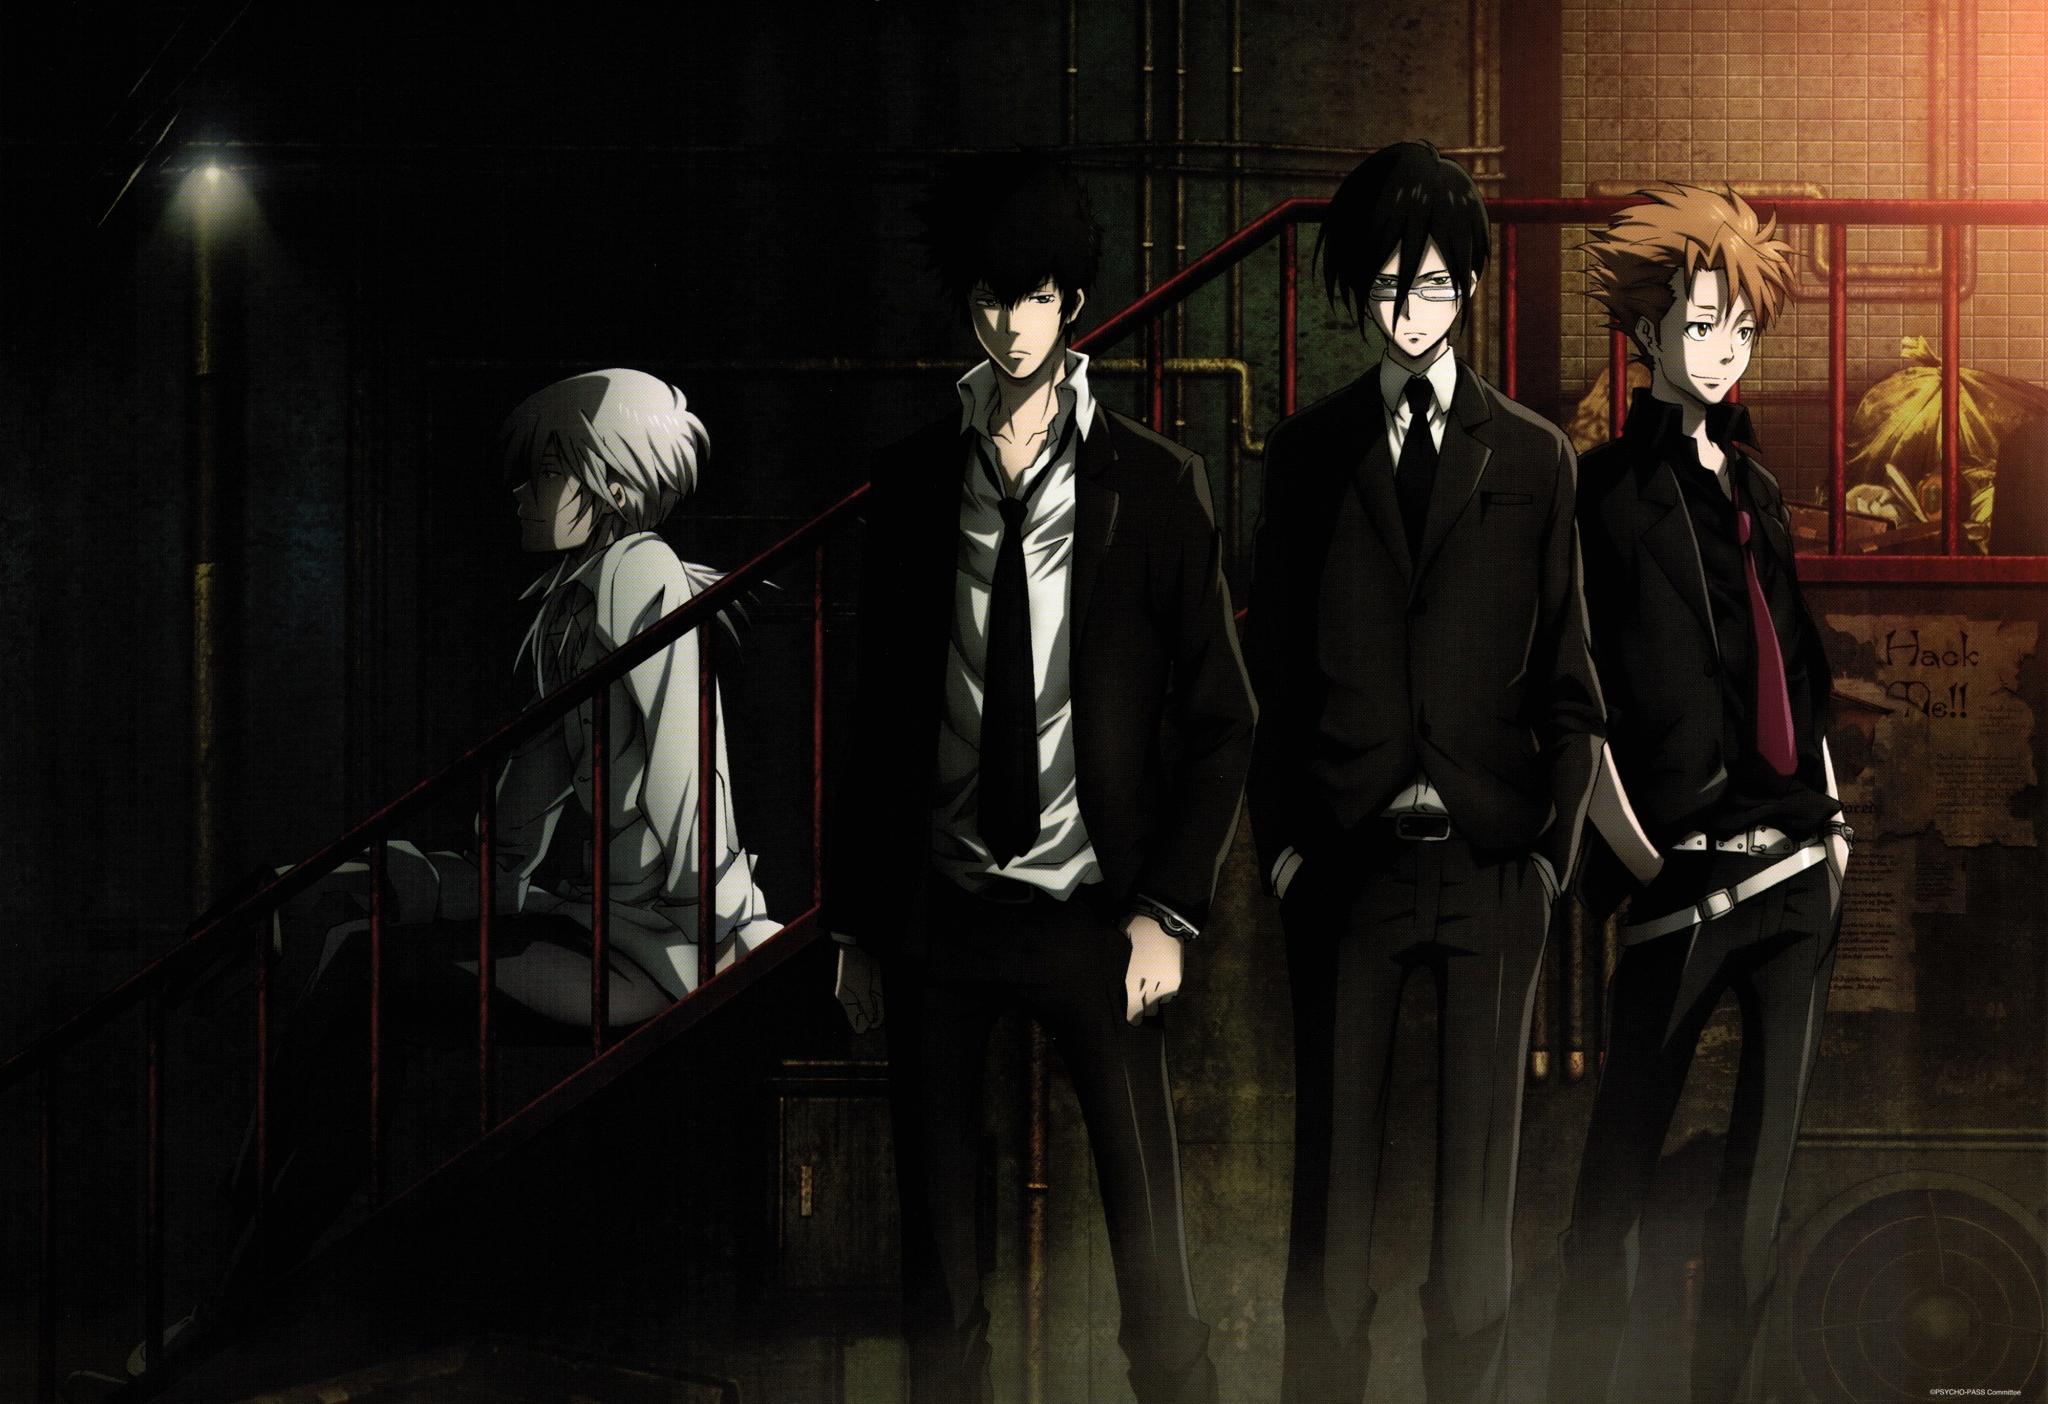 545289 - Un género, un anime - Hablemos de Anime y Manga